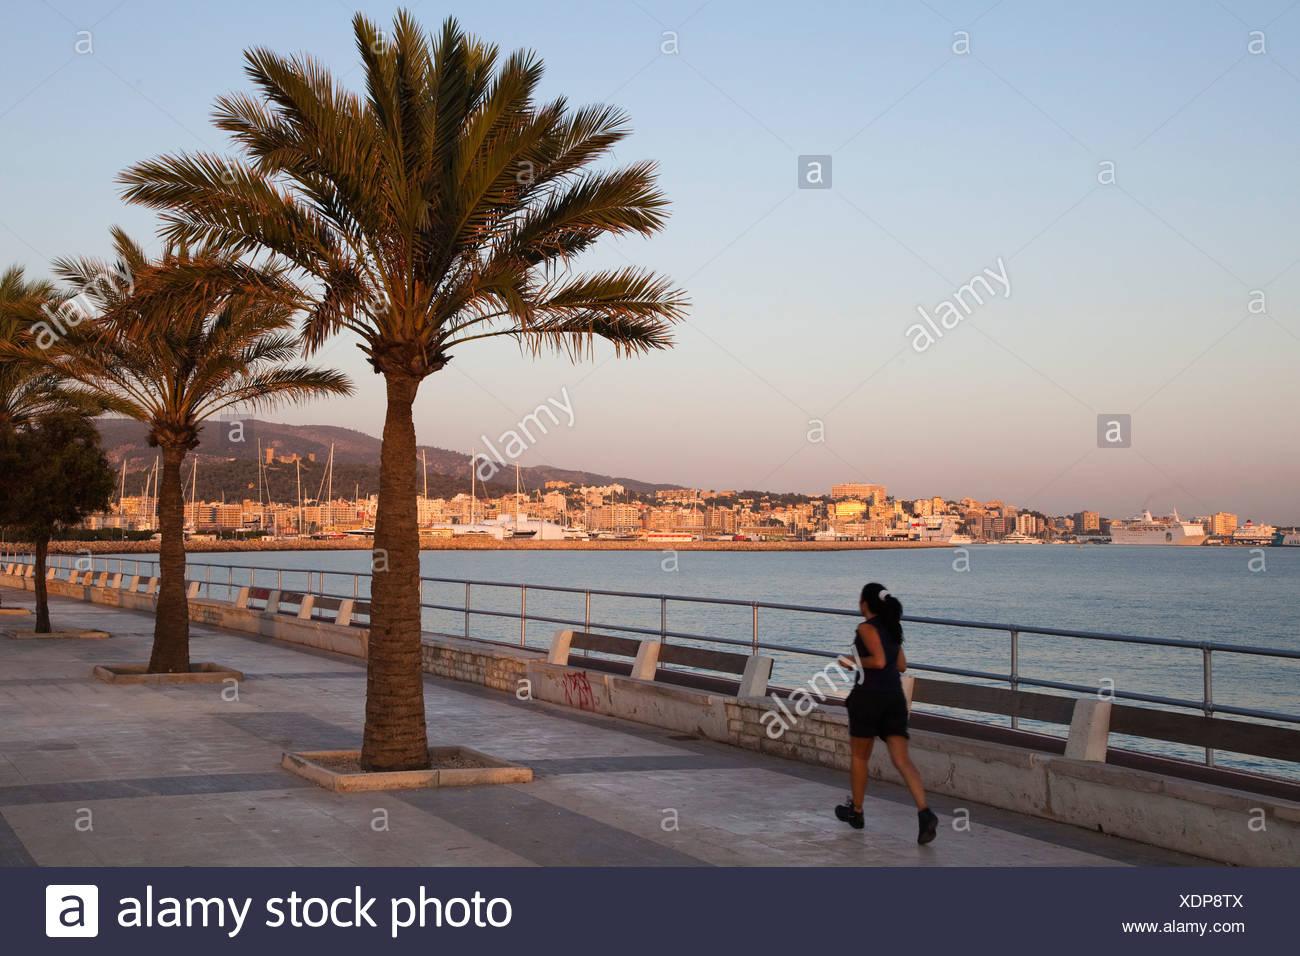 Waterfront Avinguda Gabriel Roca at Palma at sunrise, Mallorca, Balearic Islands, Mediterranean Sea, Spain, Europe - Stock Image